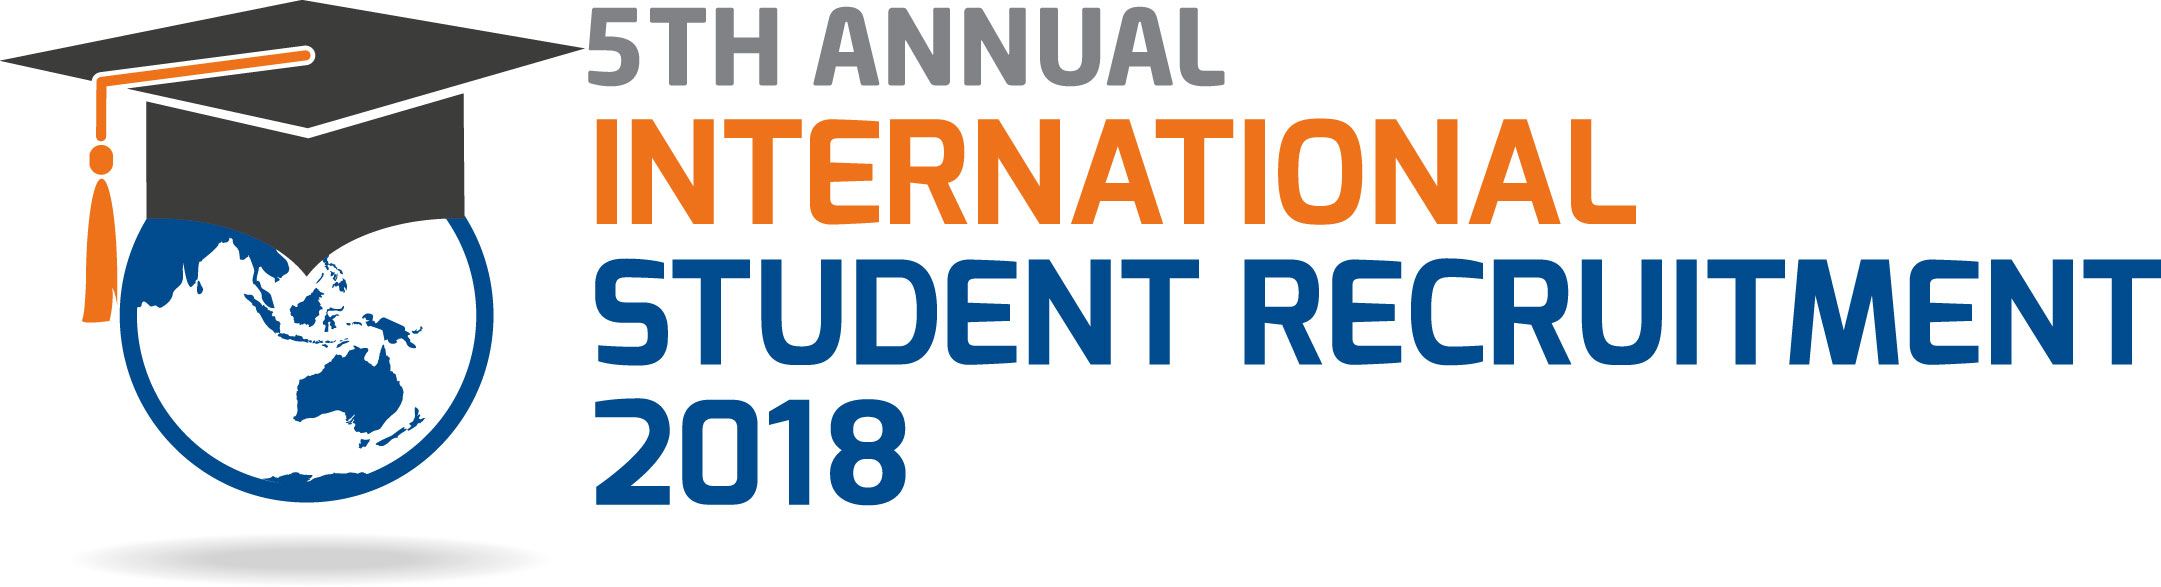 International Student Recruitment & Marketing Conference - Draft Agenda